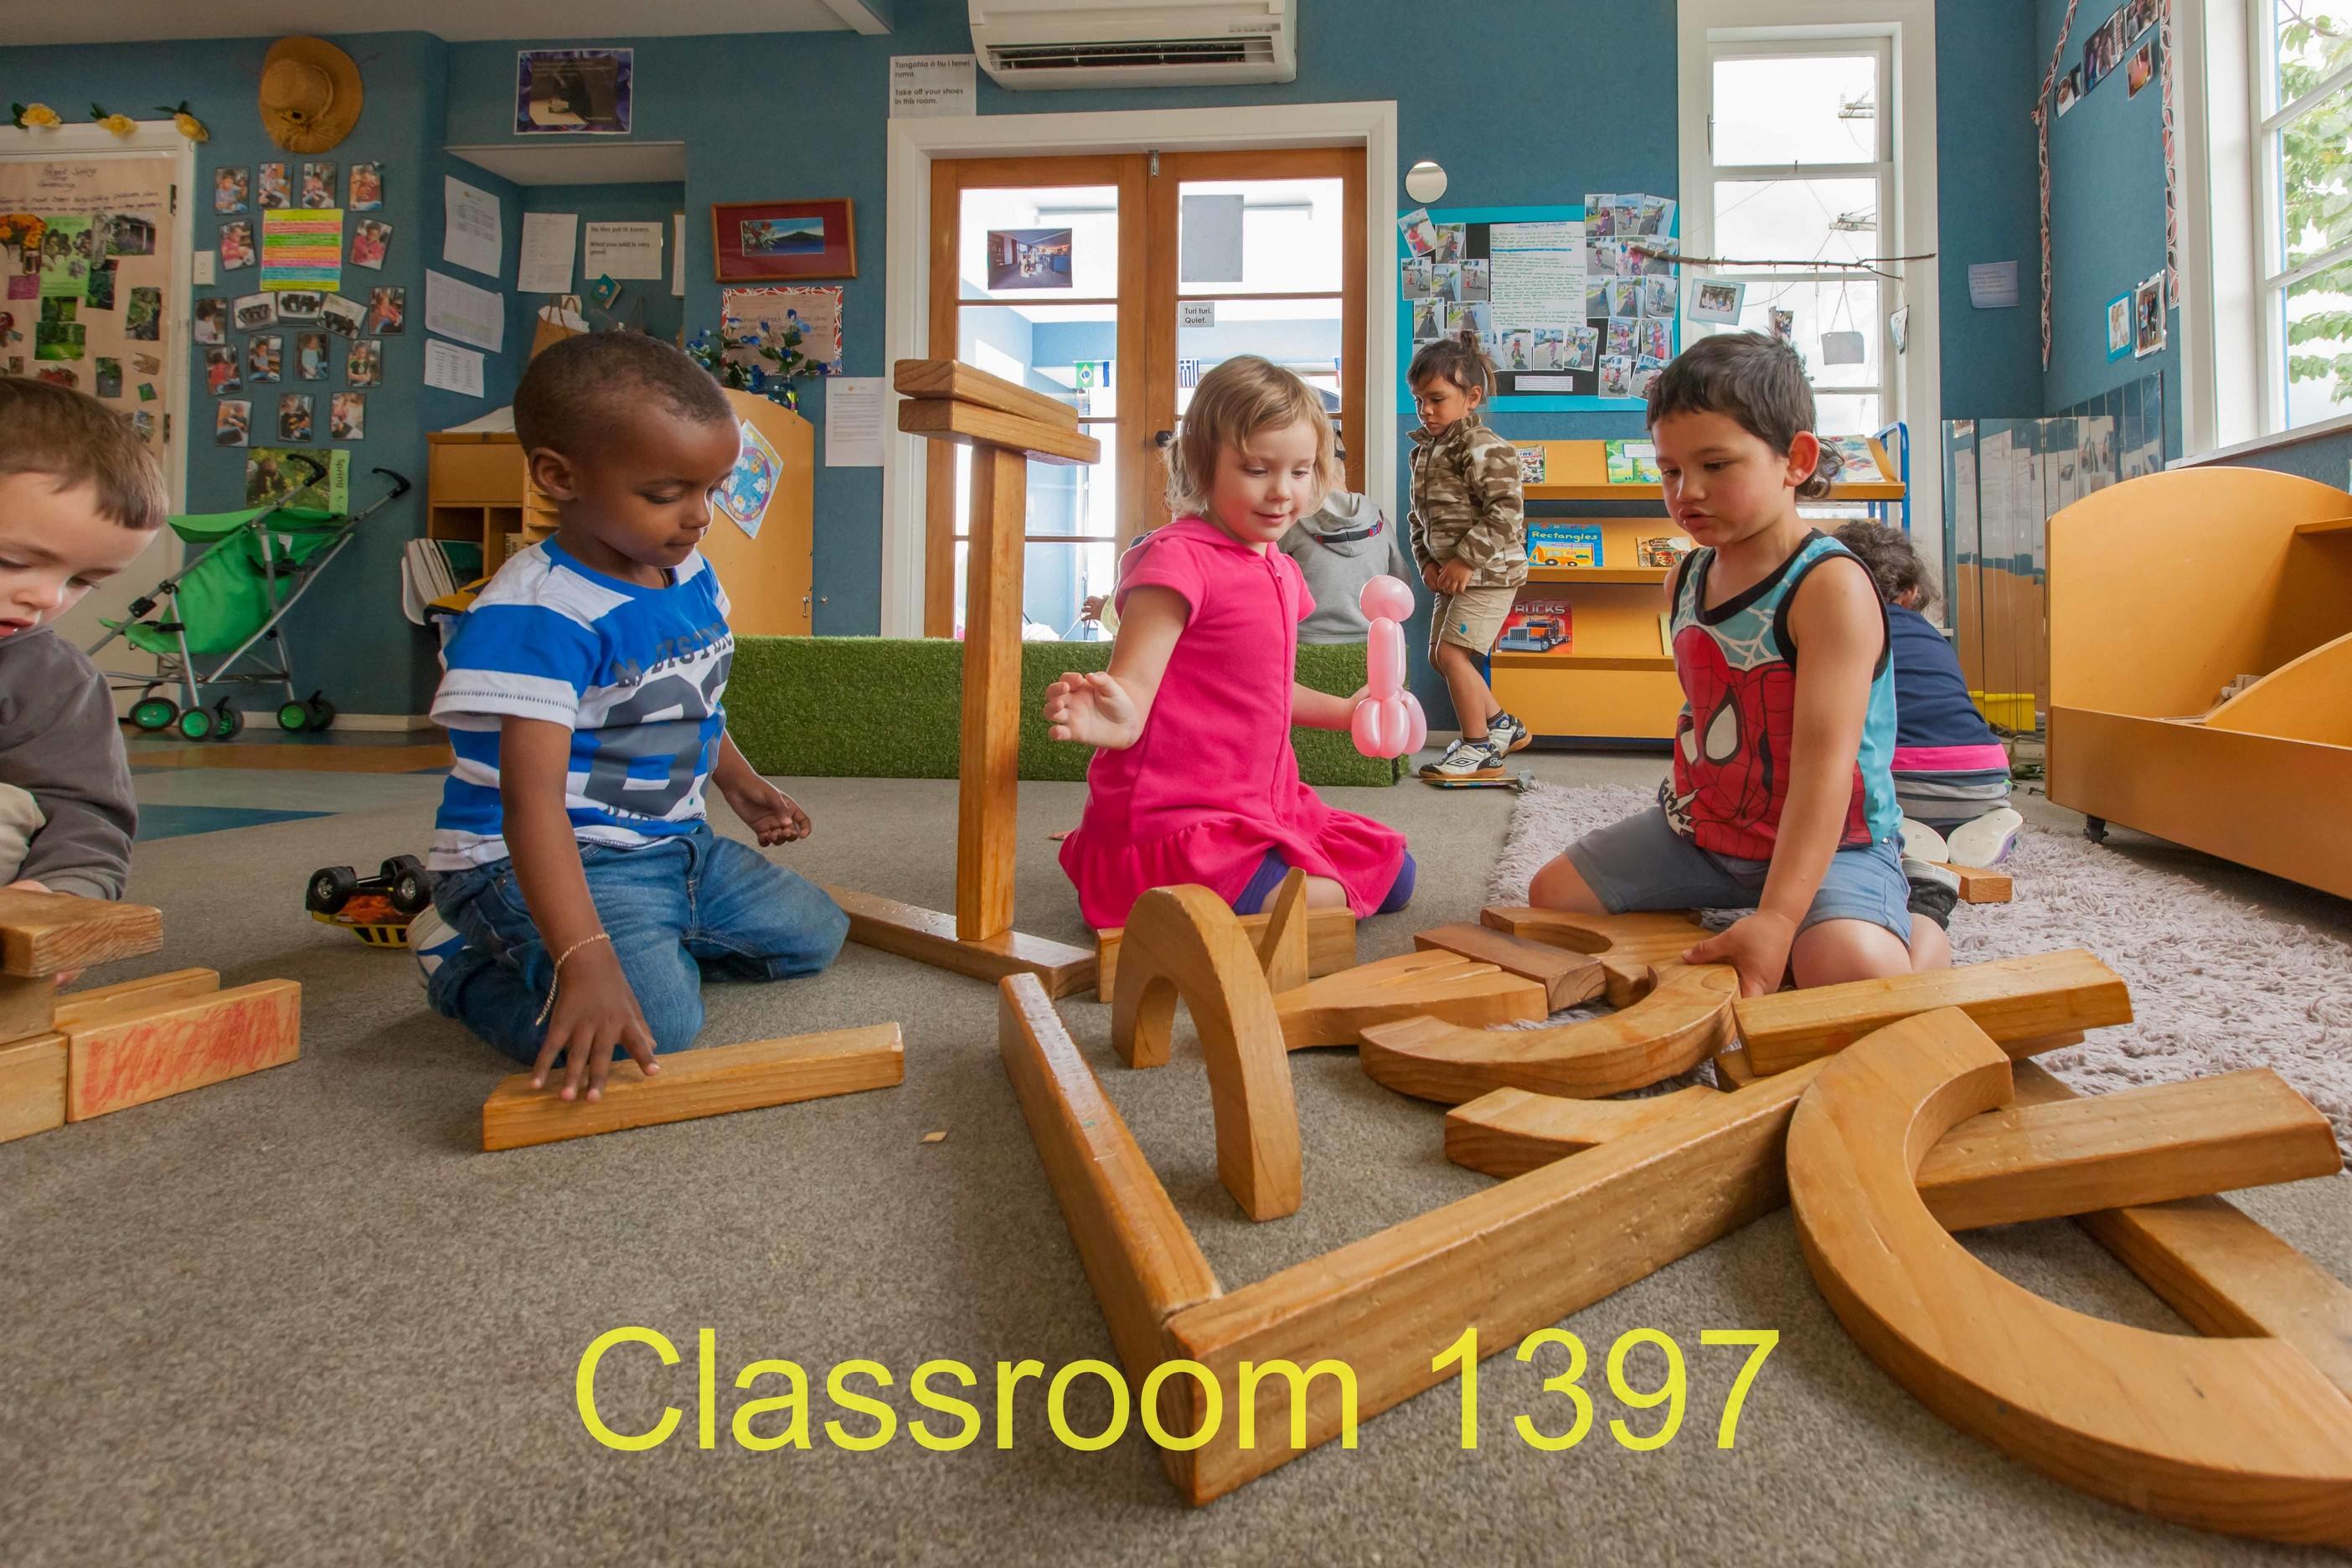 Classroom 1397